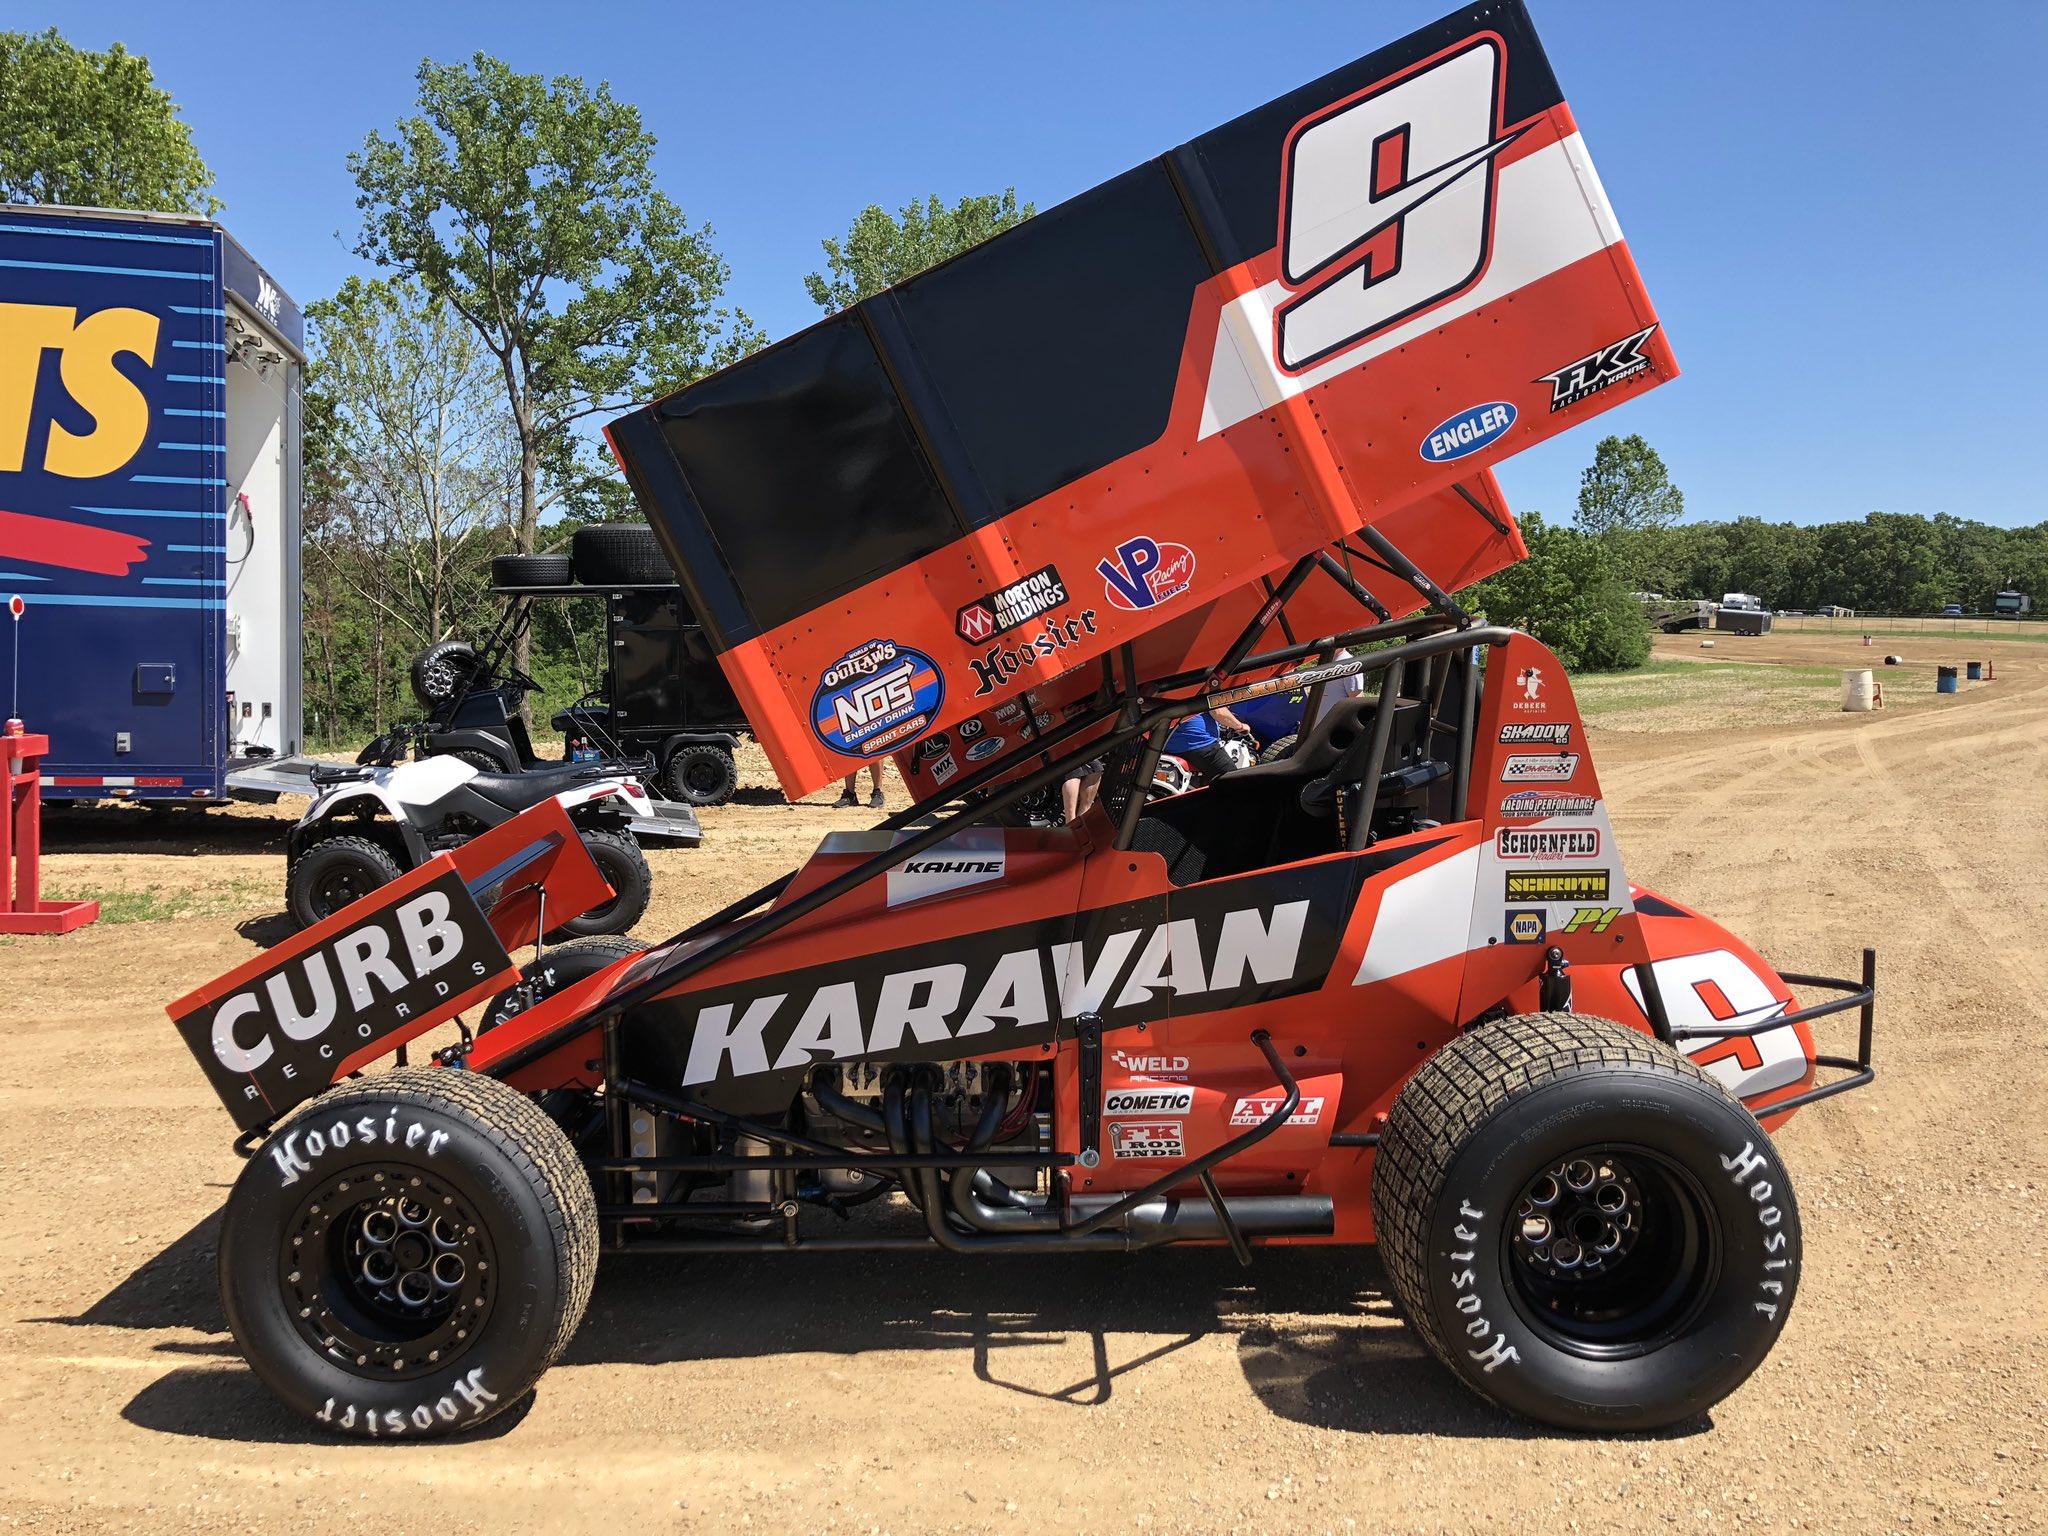 Kasey Kahne - World of Outlaws Sprint Car - Lake Ozark Speedway